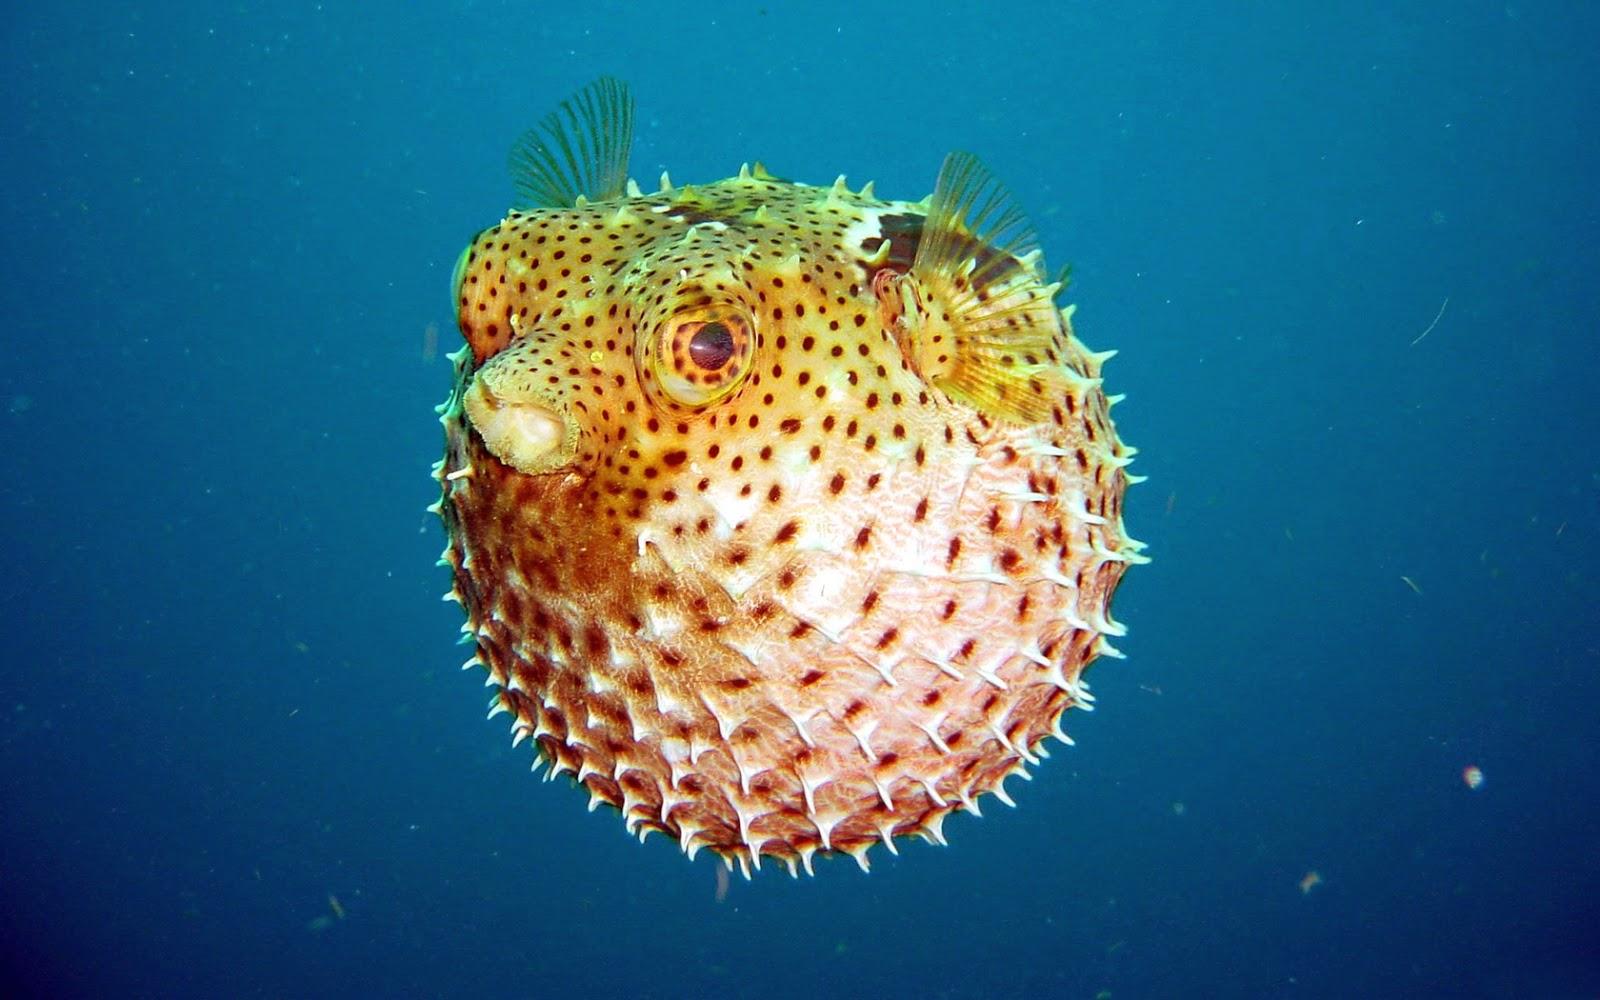 pesce palla velenoso